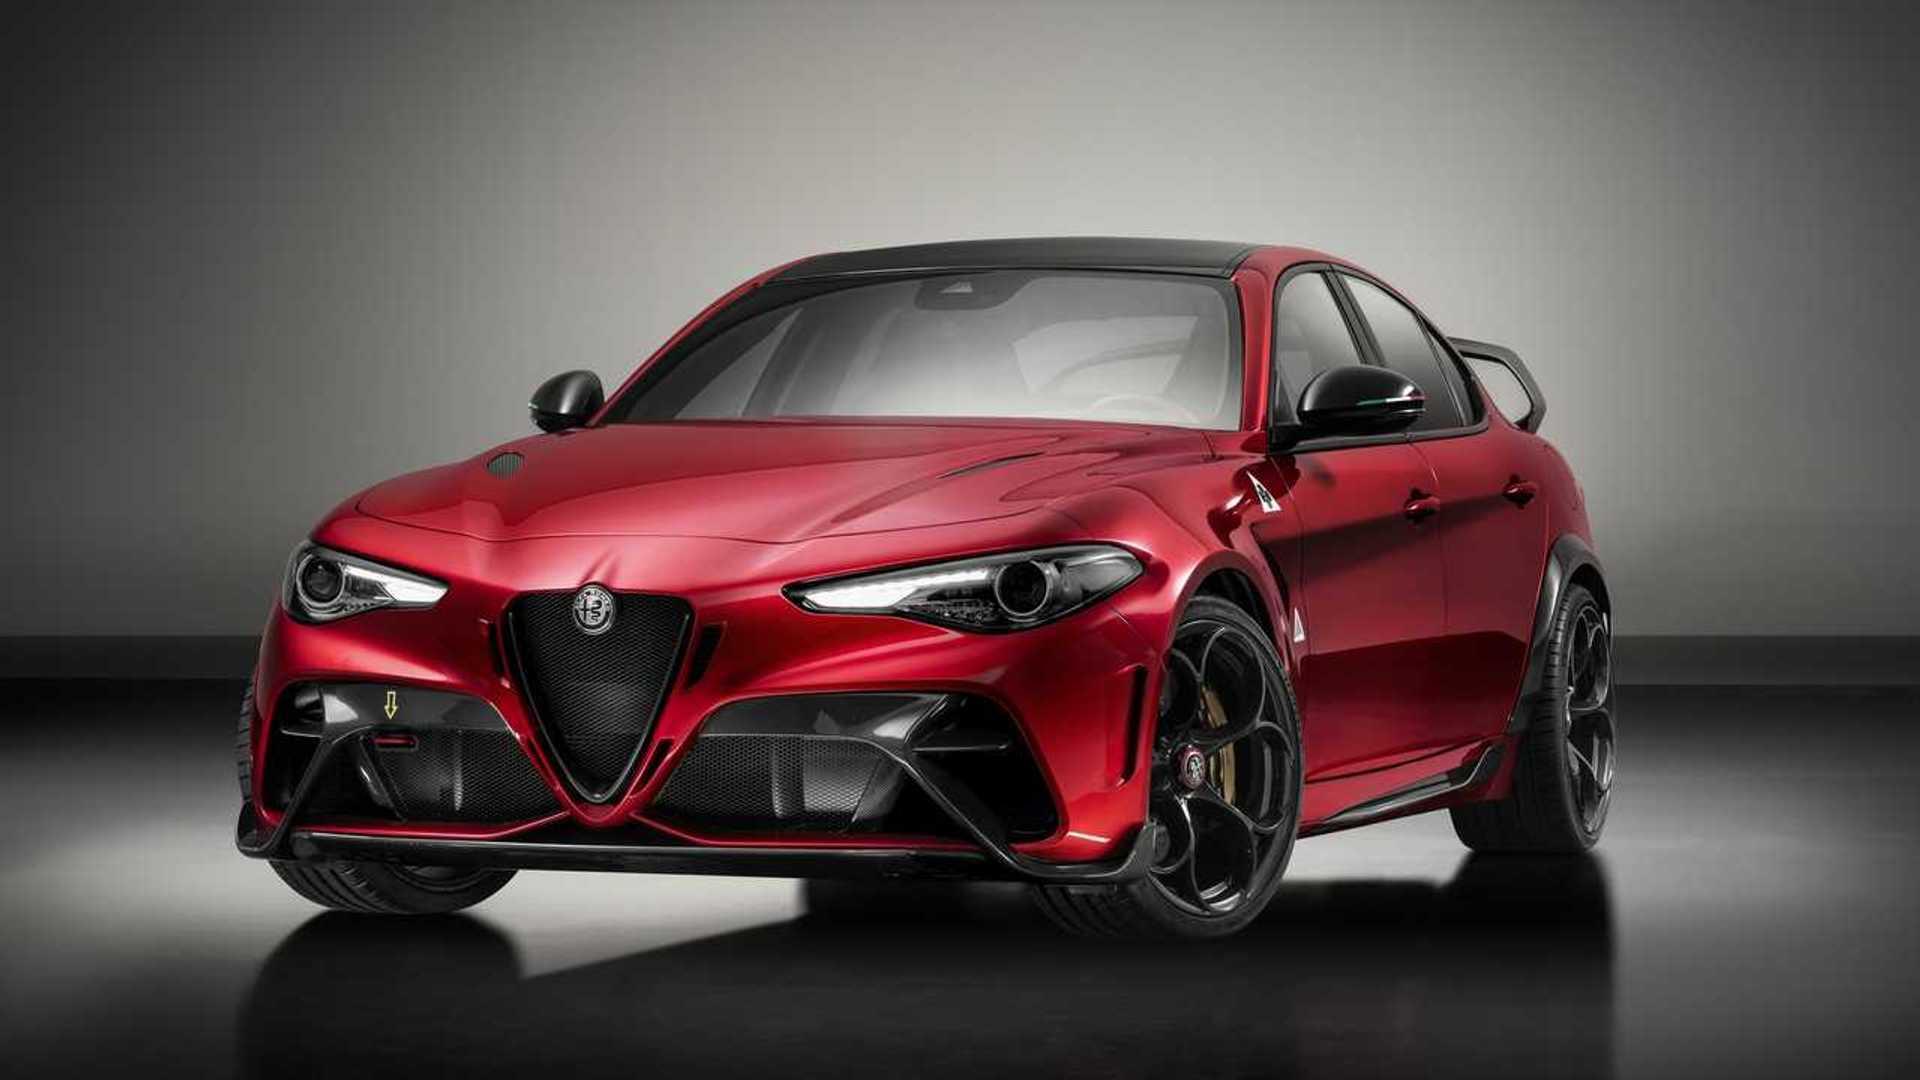 Alfa Romeo Giulia Gta Gtam Debut As Lightweight 533 Hp Sedans